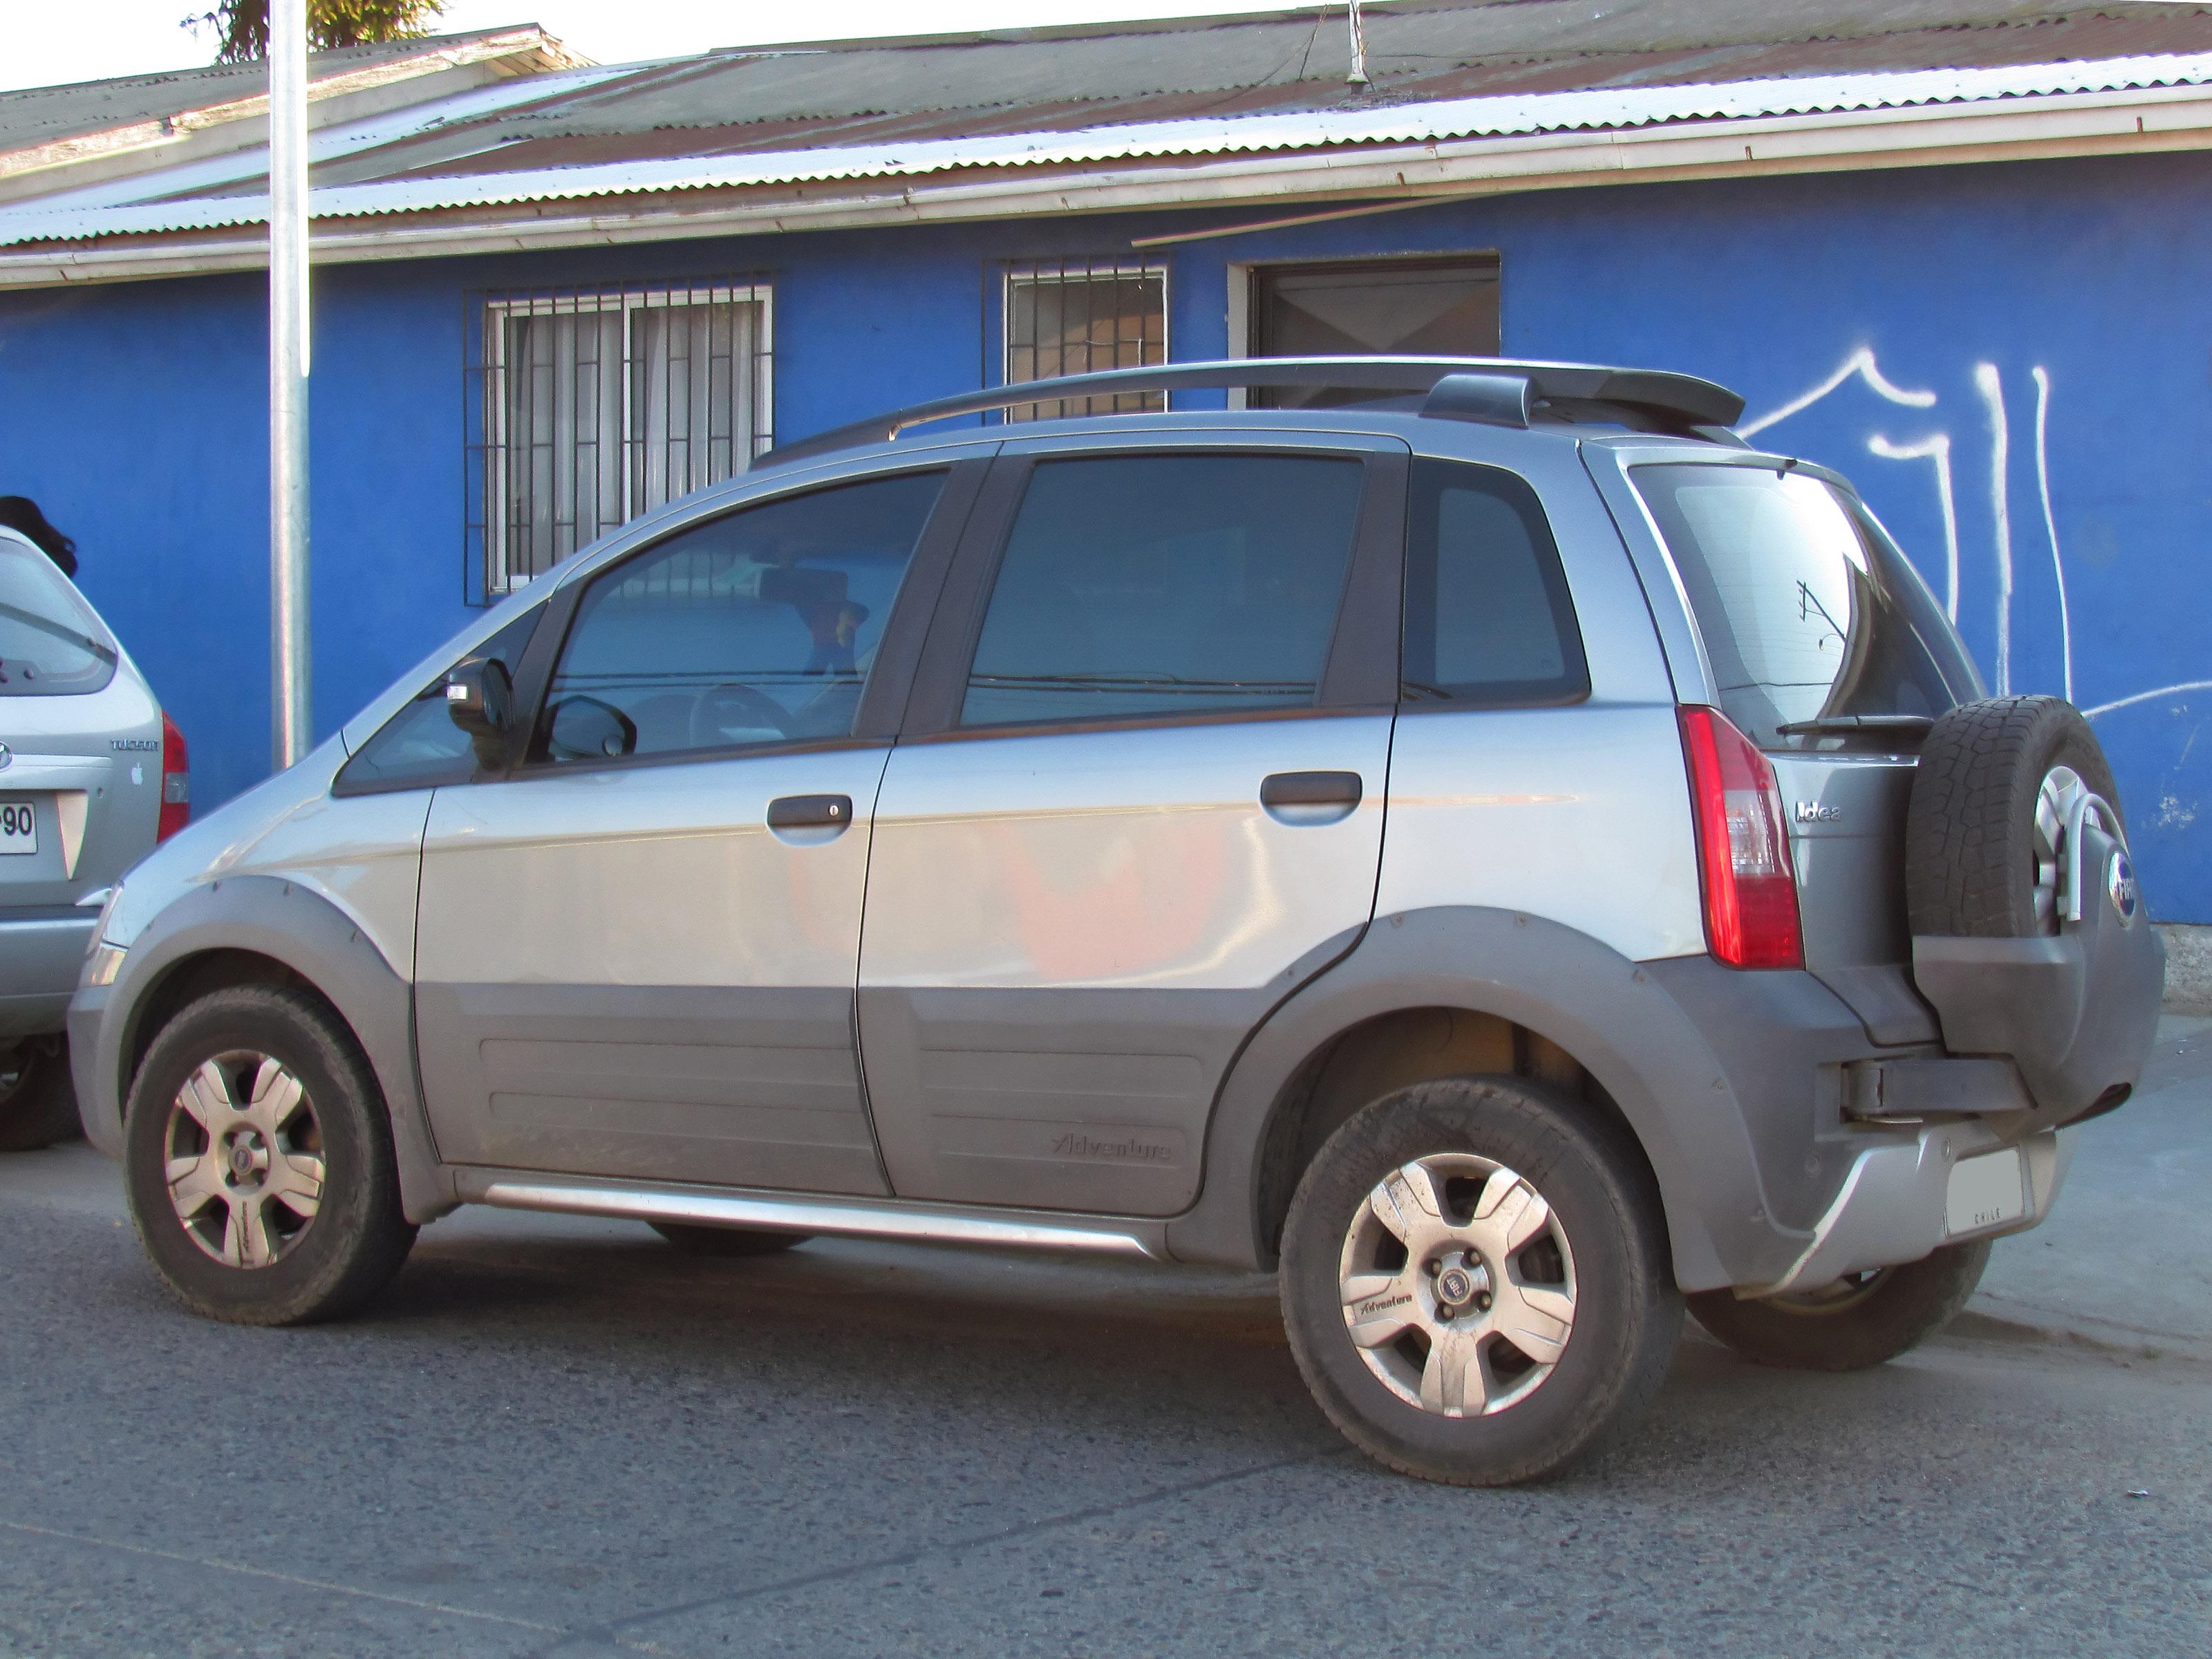 File 08 Italian Xuv Fiat Idea Adventure Brasil Sud America Grey Facing Left Blue House Jpg